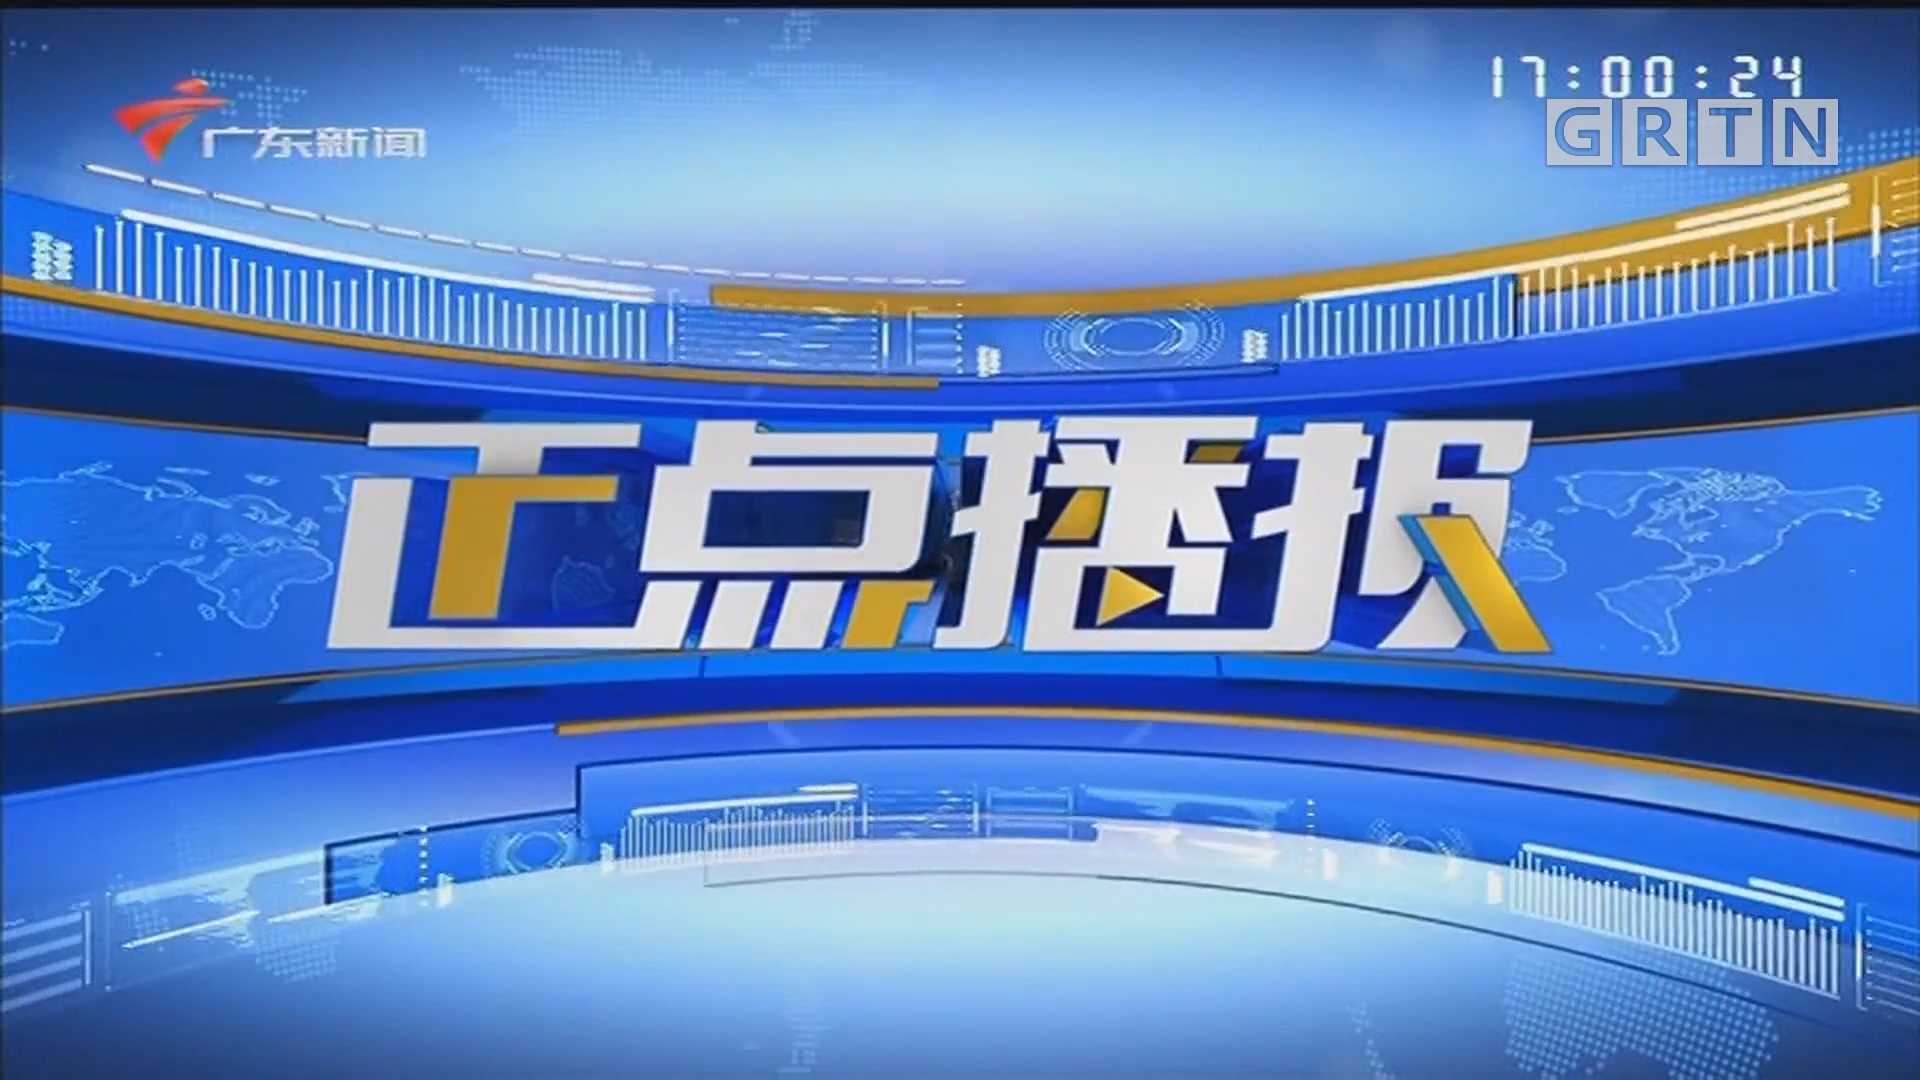 [HD][2020-01-14-17:00]正点播报:广东省第十三届人民代表大会第三次会议开幕